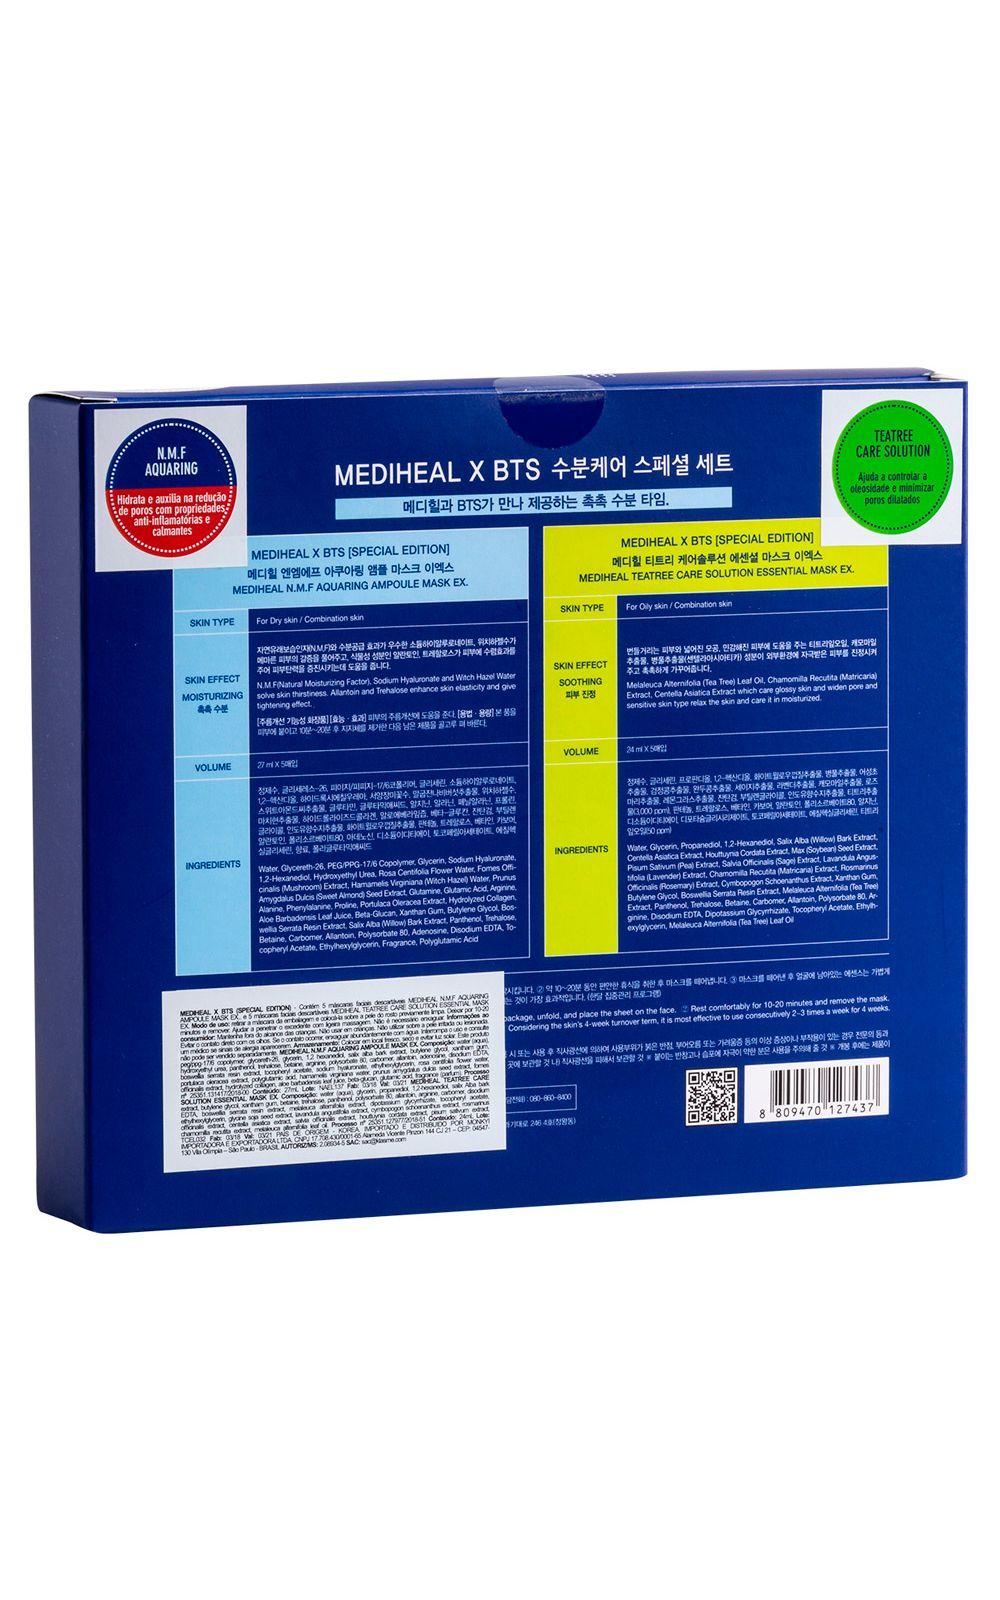 Foto 4 - Mediheal Kit - Máscaras Faciais + Photocard BTS - nenhuma